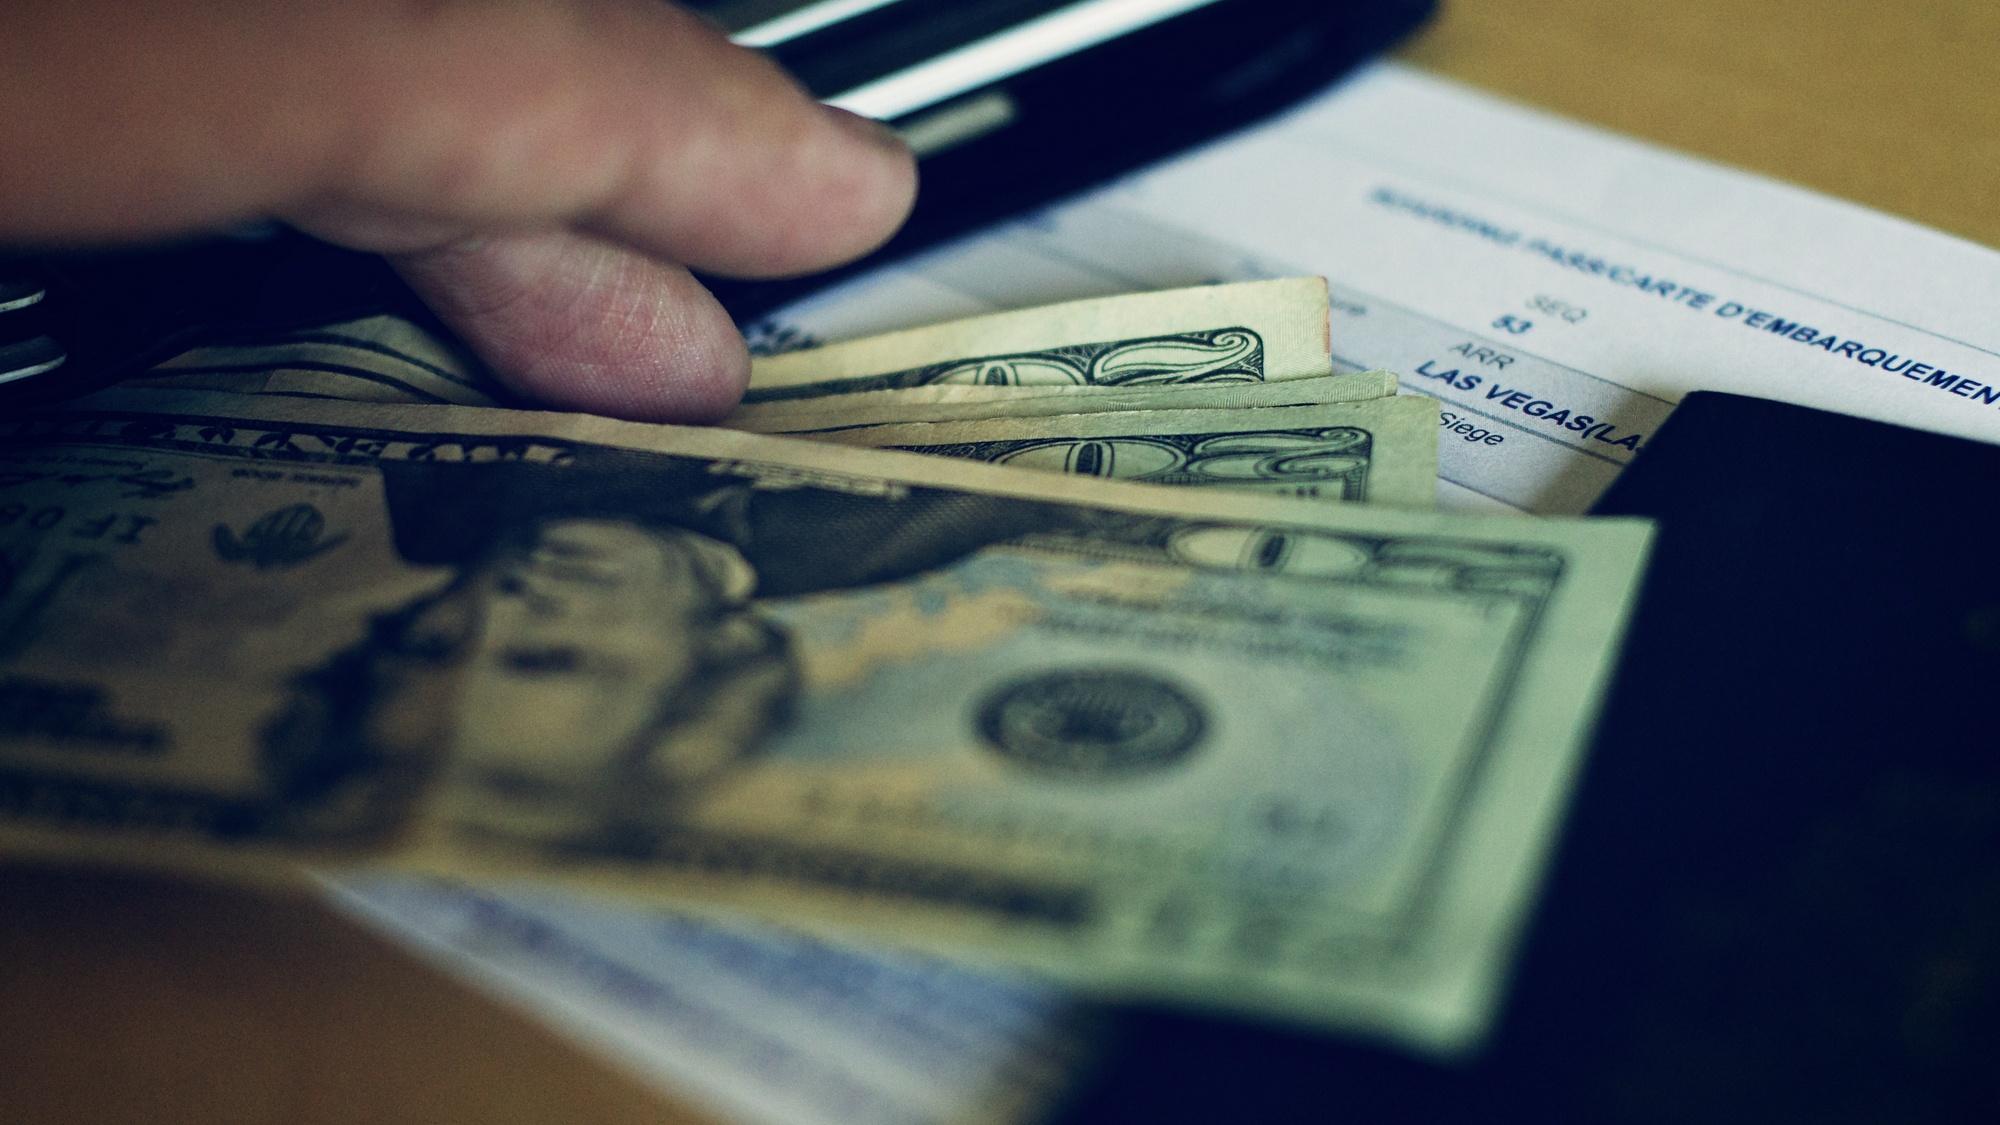 earn money through ridesharing.